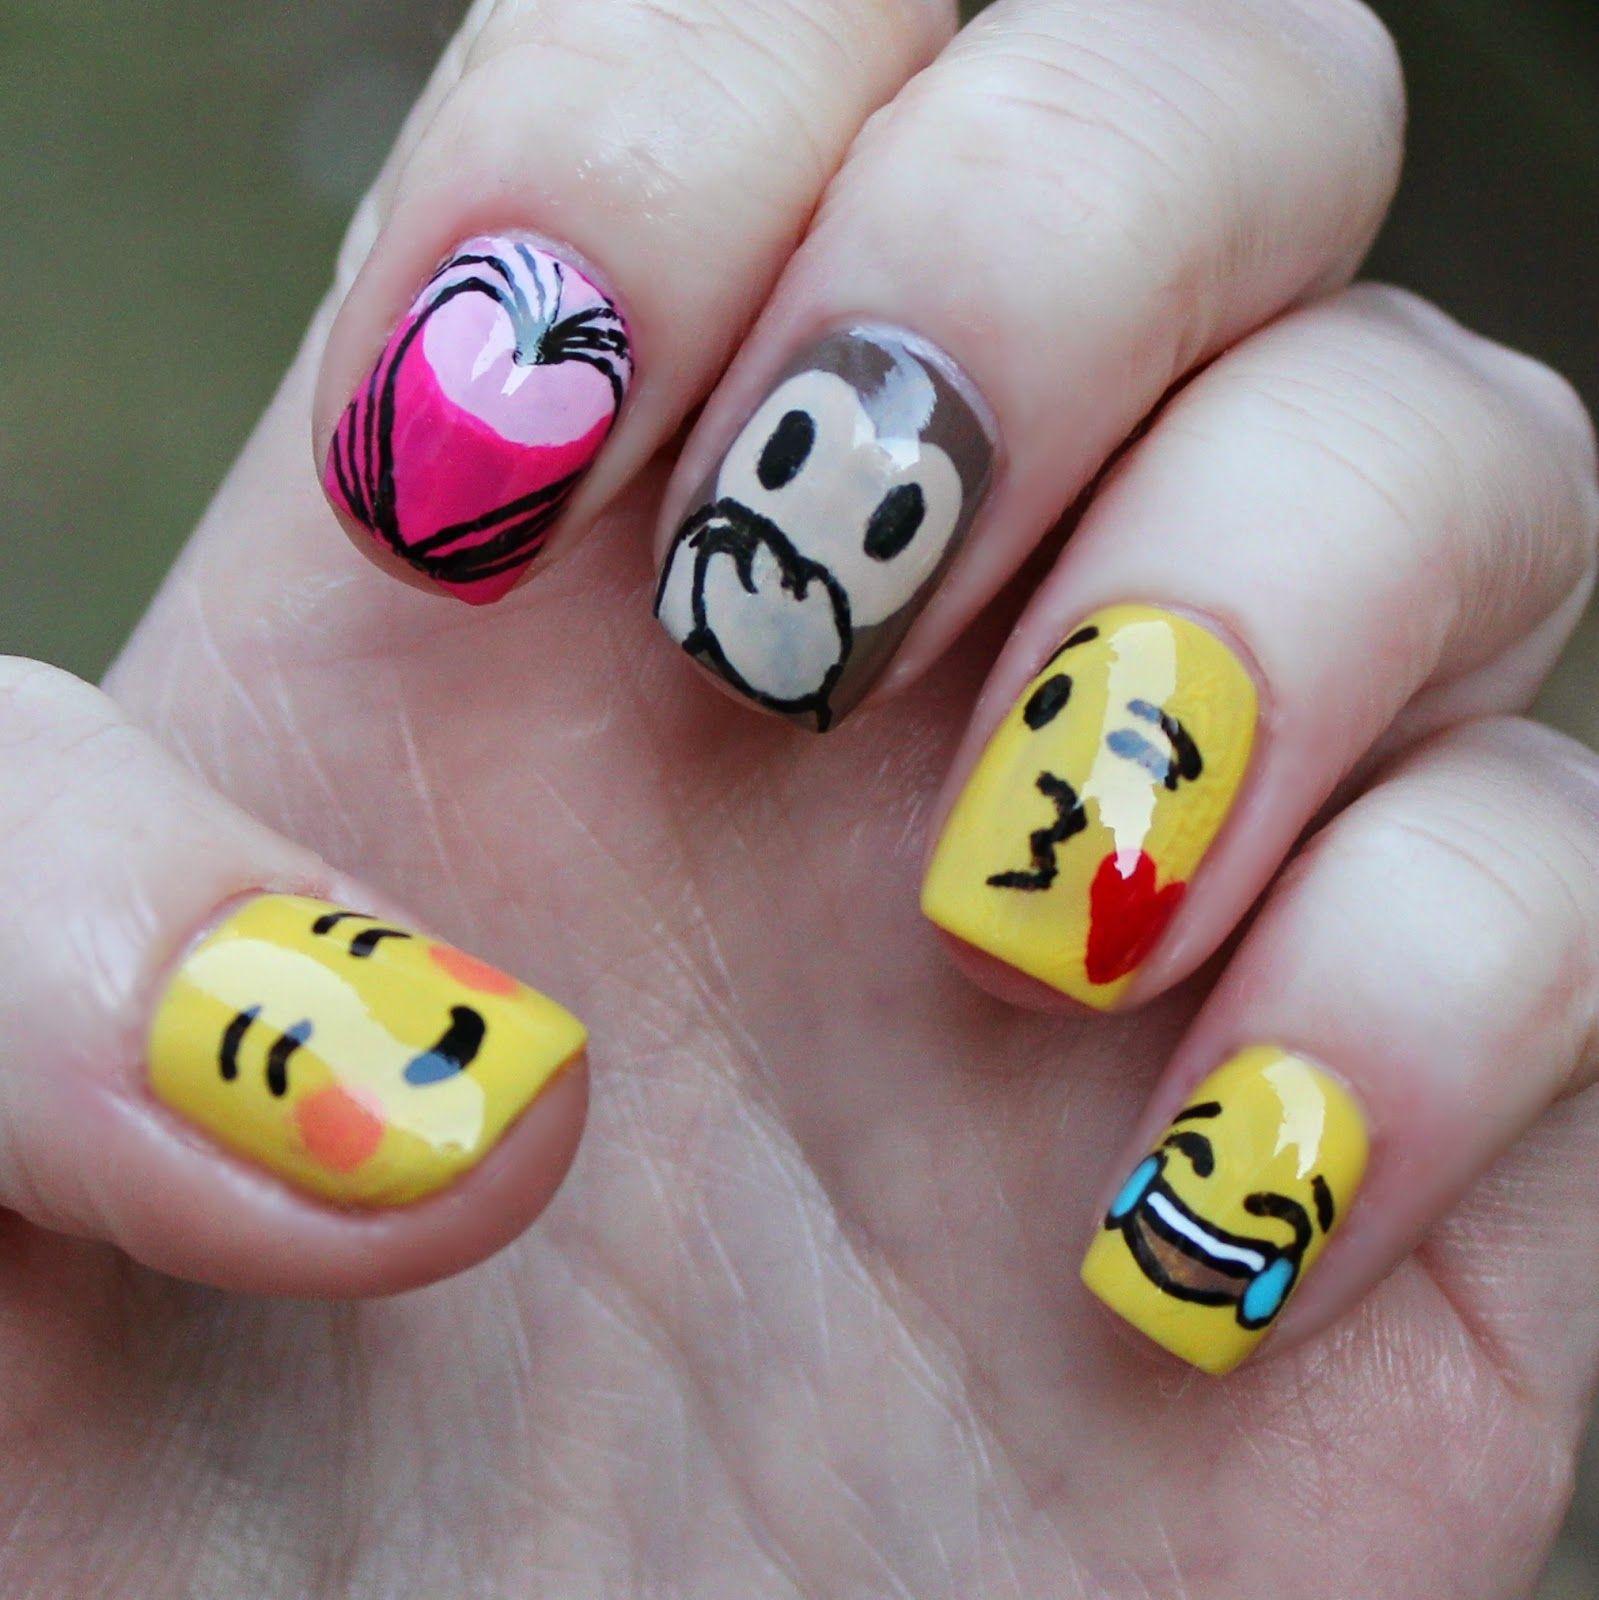 Emoji Nails for Beauty At Tesco   Nails designs   Pinterest